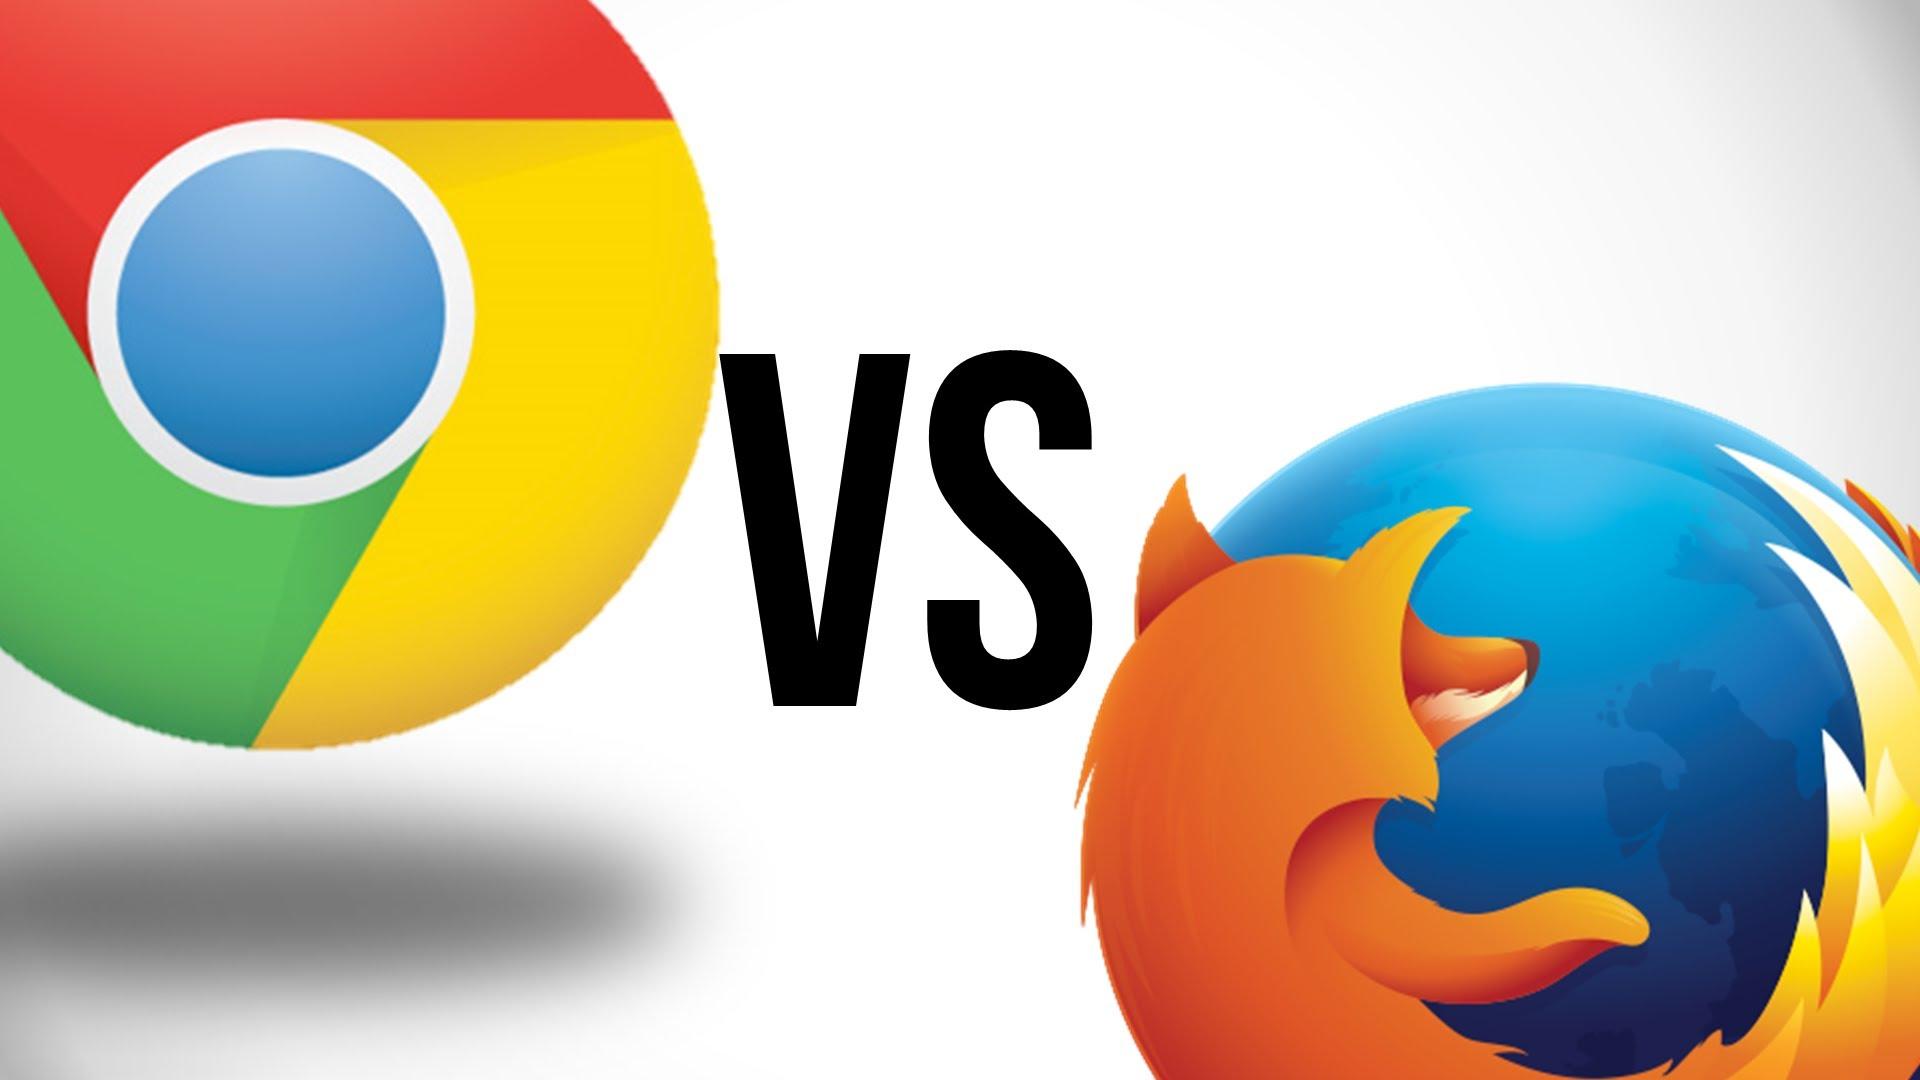 Firefox le pega a Chrome donde más le duele | El Imparcial de Oaxaca